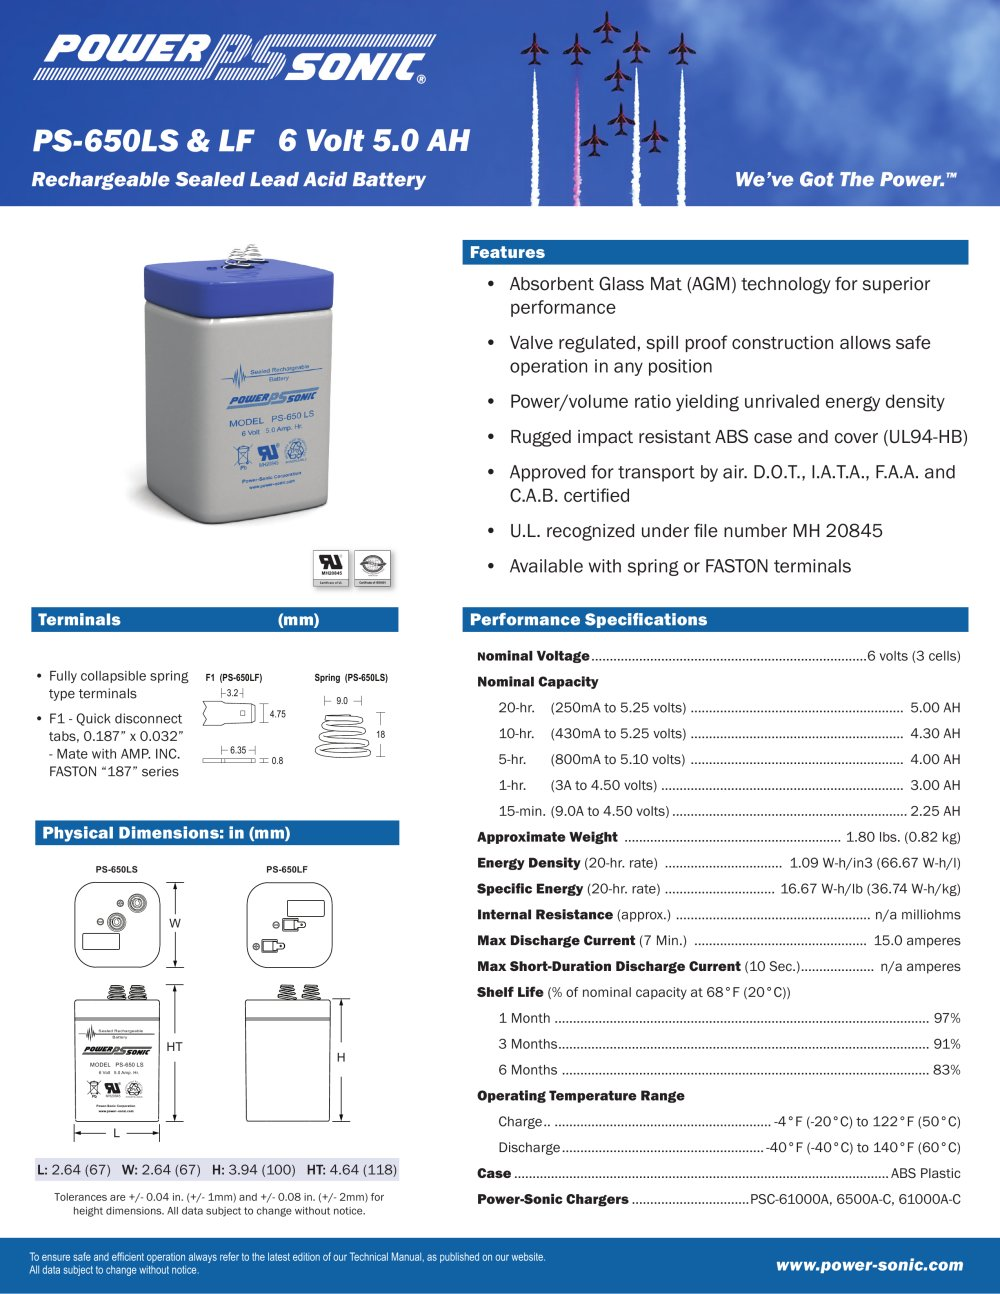 Ps 650ls Lf Power Sonic Pdf Catalogue Technical Charger Desktop 1 2 Pages